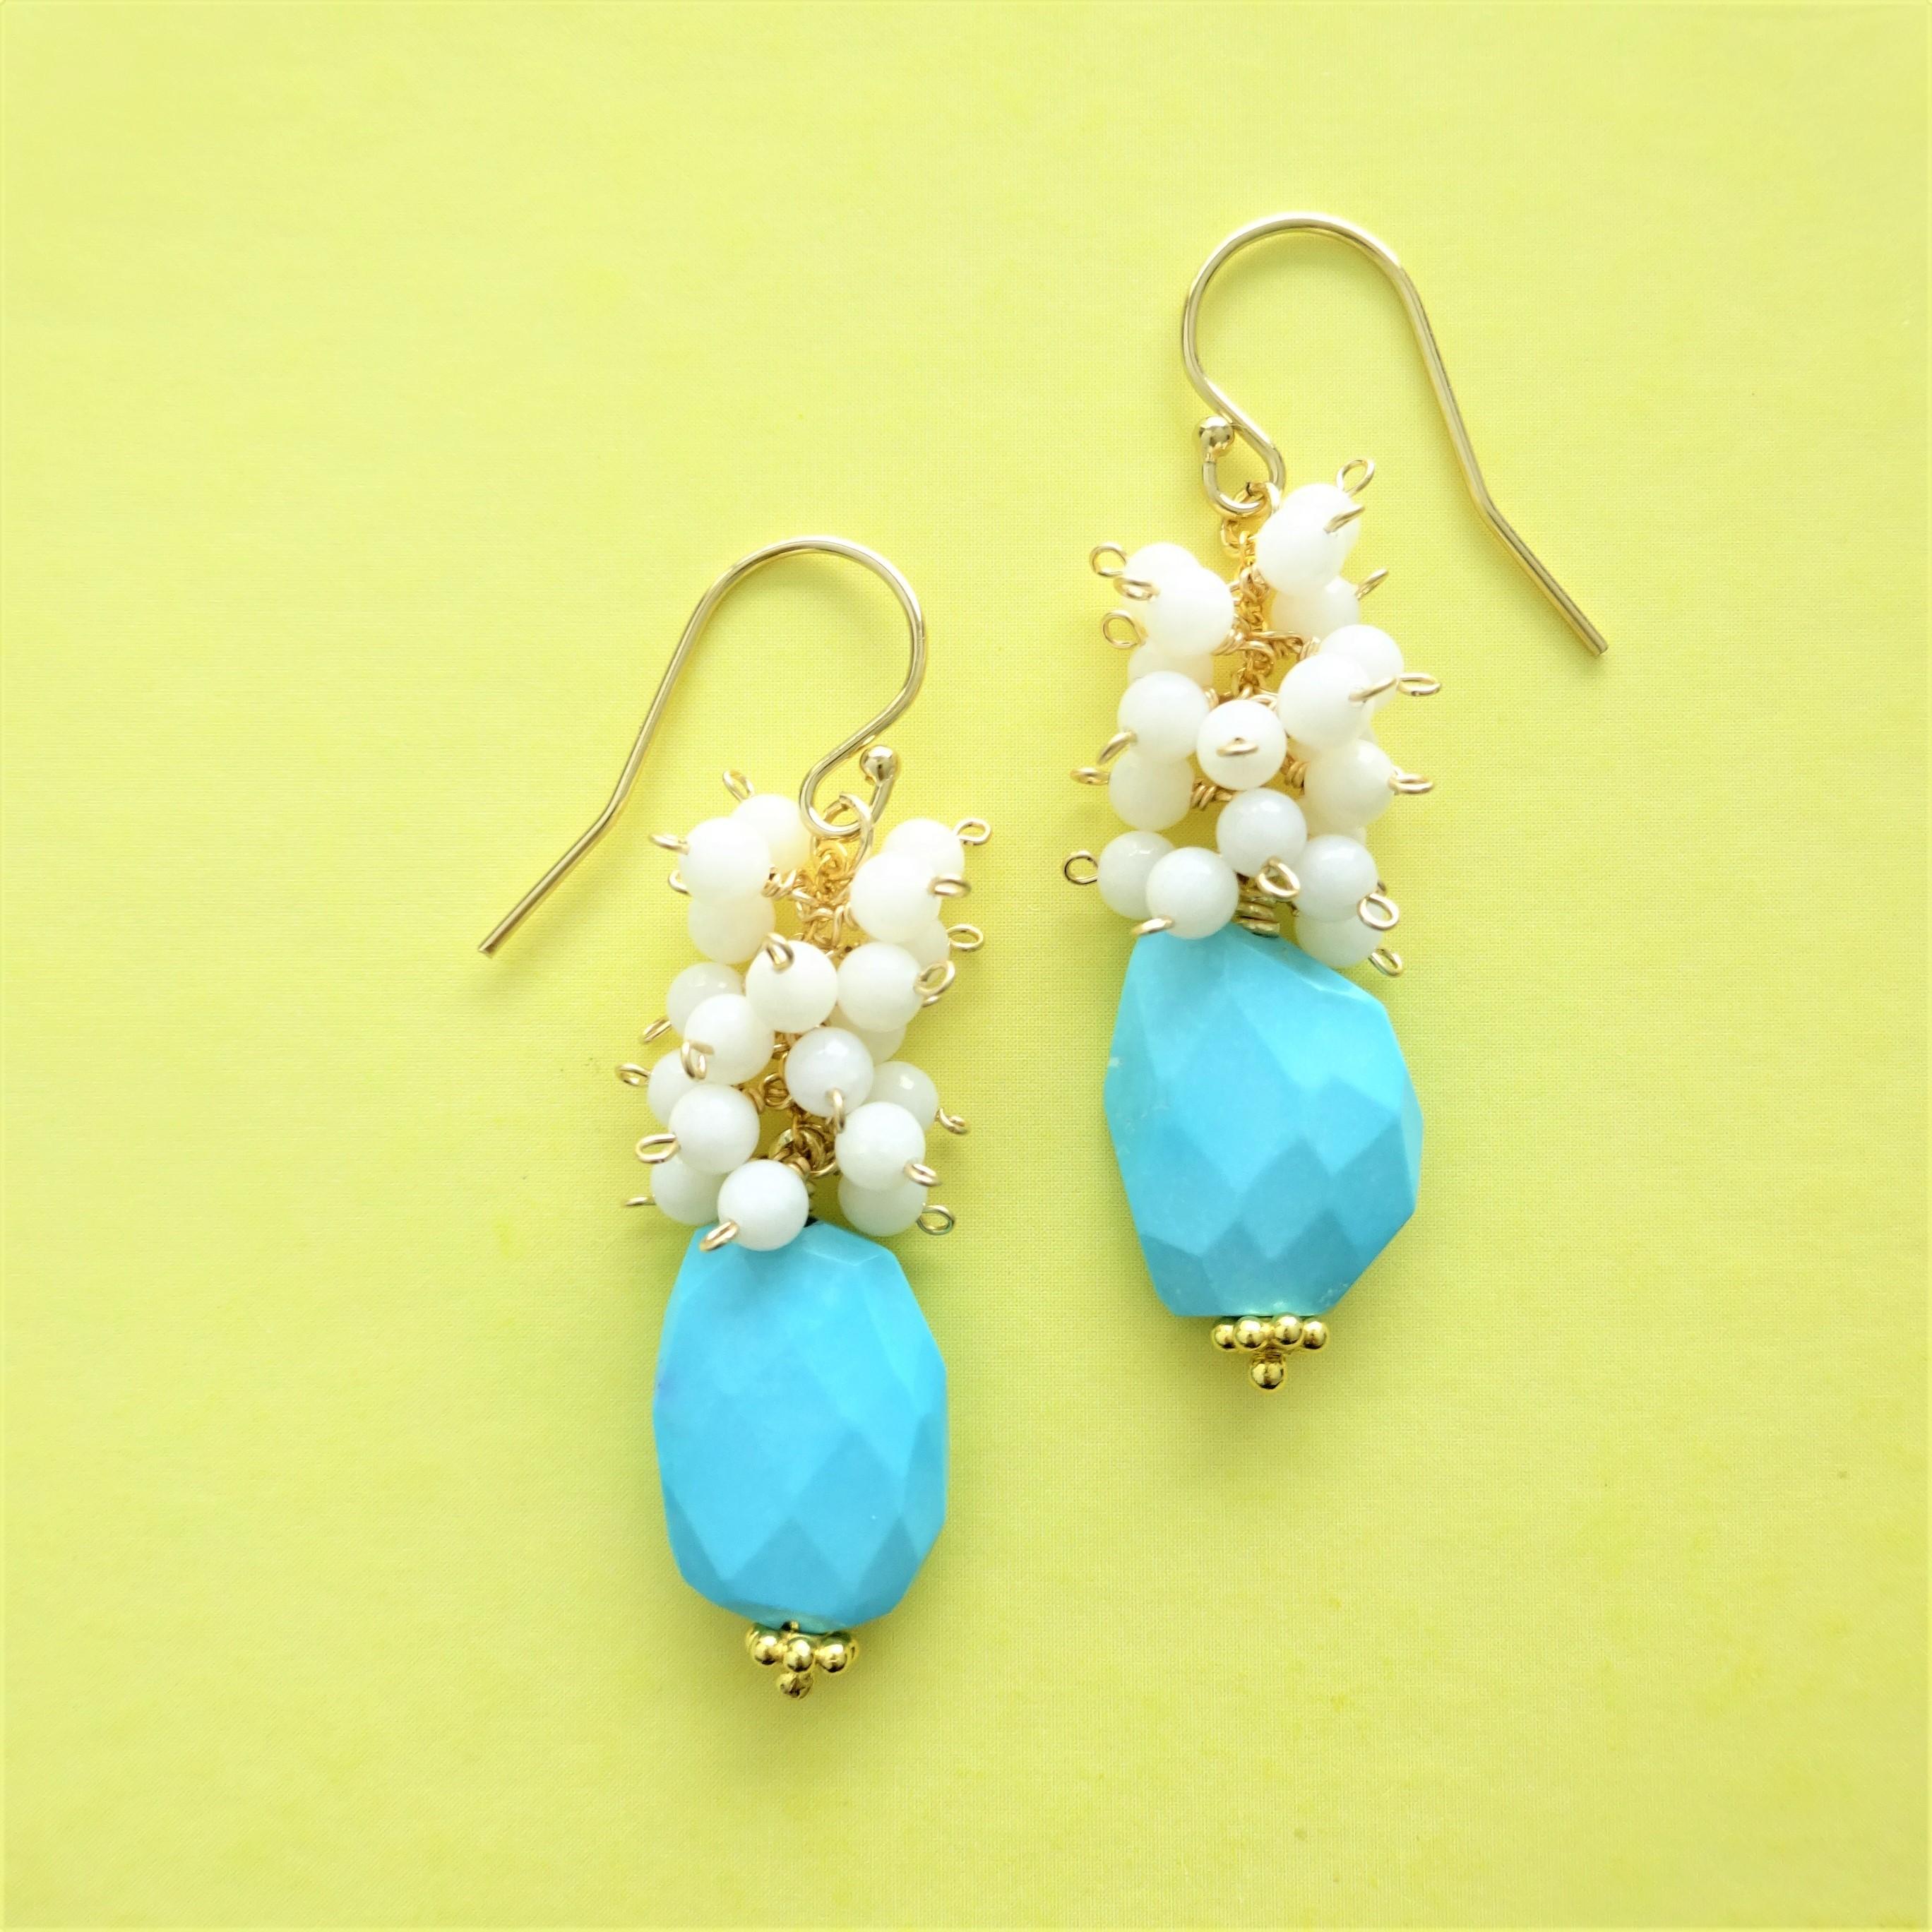 送料無料 14kgf*Sleeping Beauty Turquoise volume pierced earring